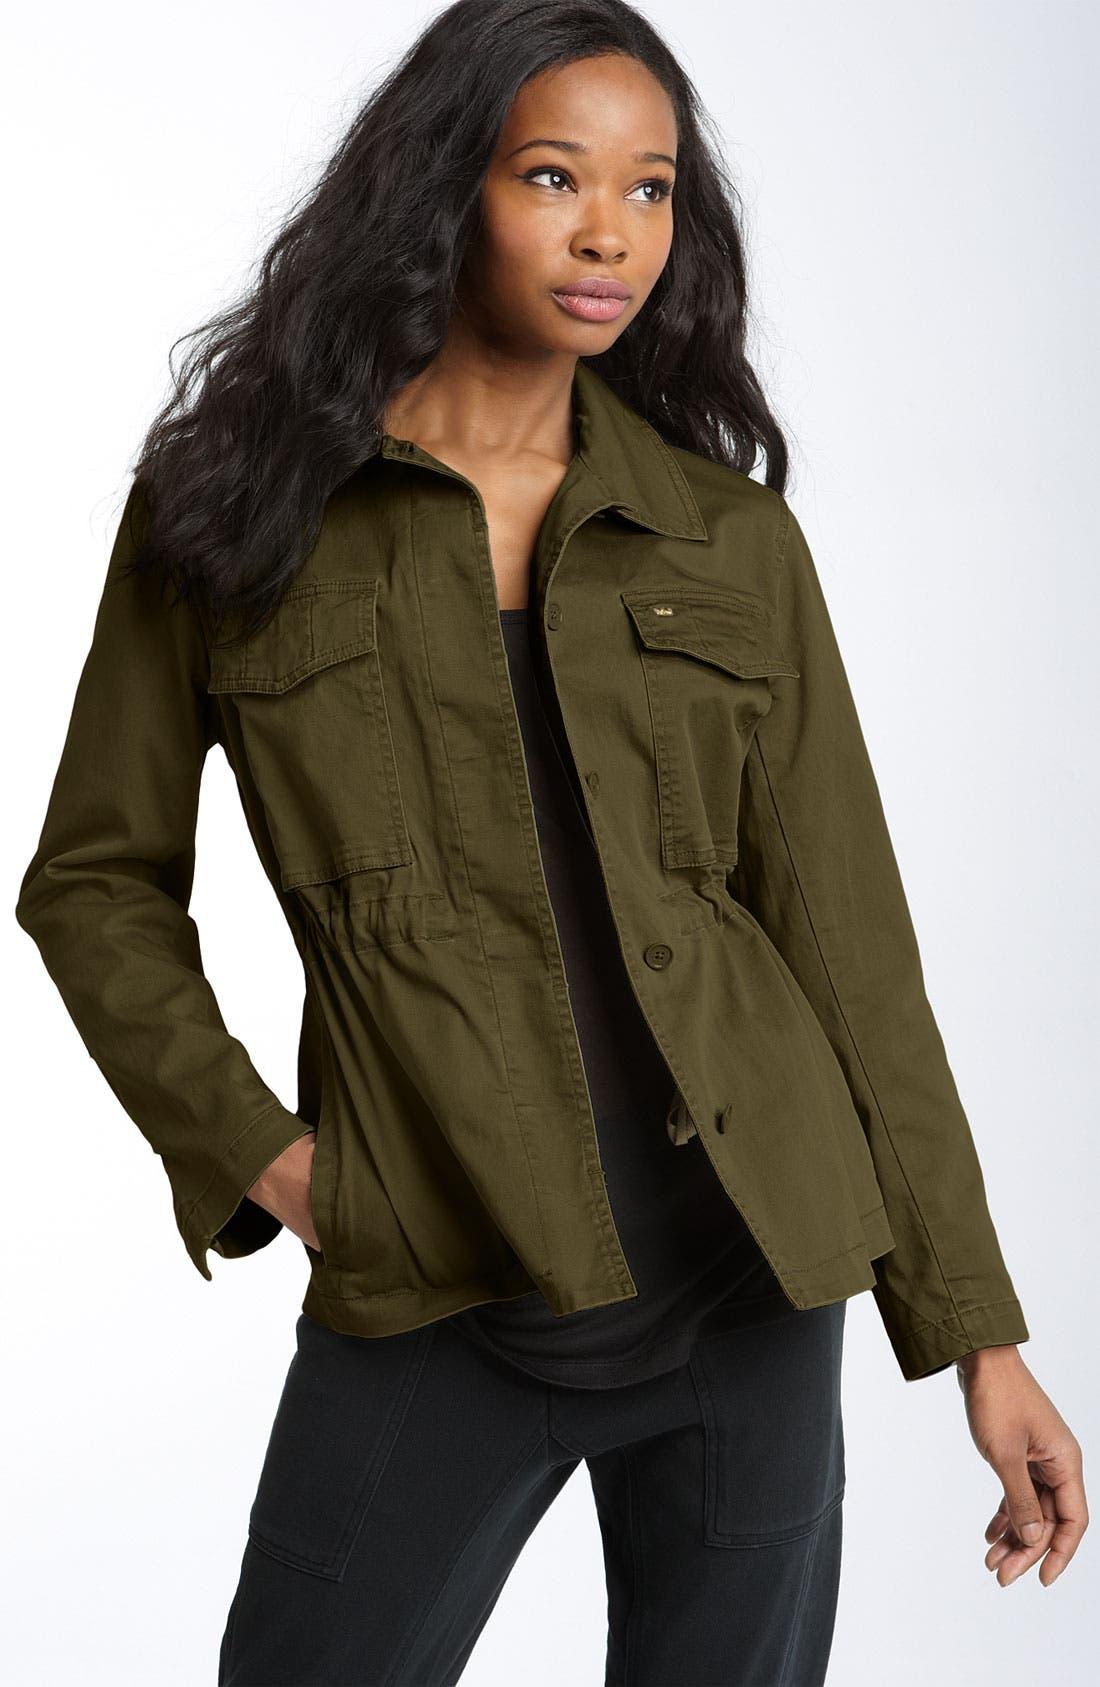 Alternate Image 1 Selected - MARC BY MARC JACOBS 'Uniform' Cotton Jacket